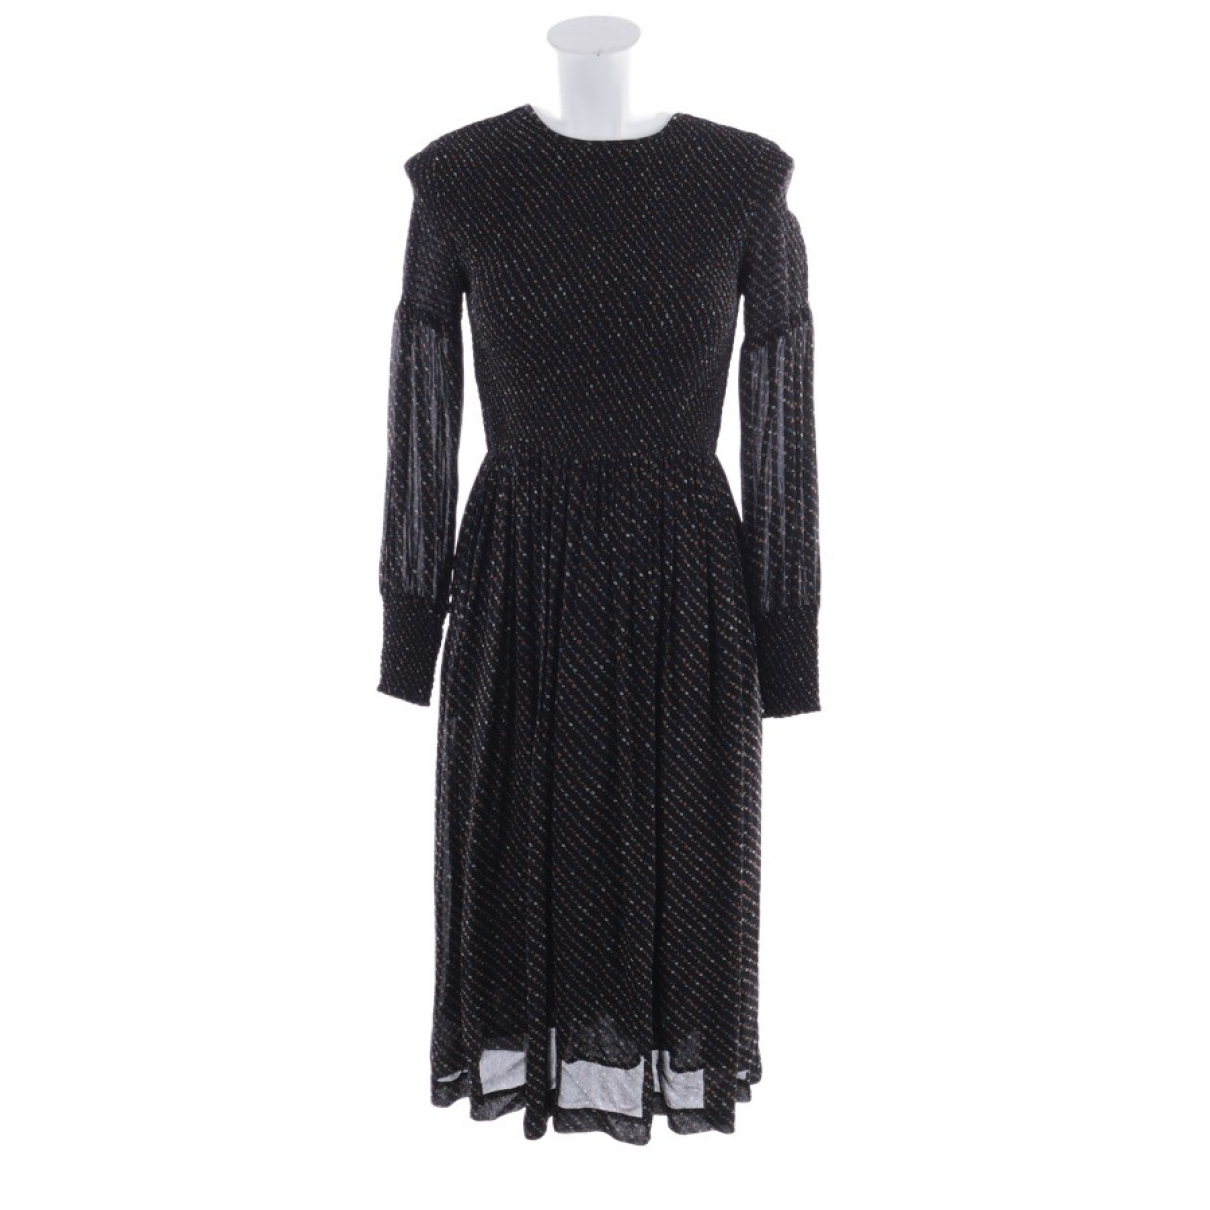 Ganni \N Black dress for Women 32 FR